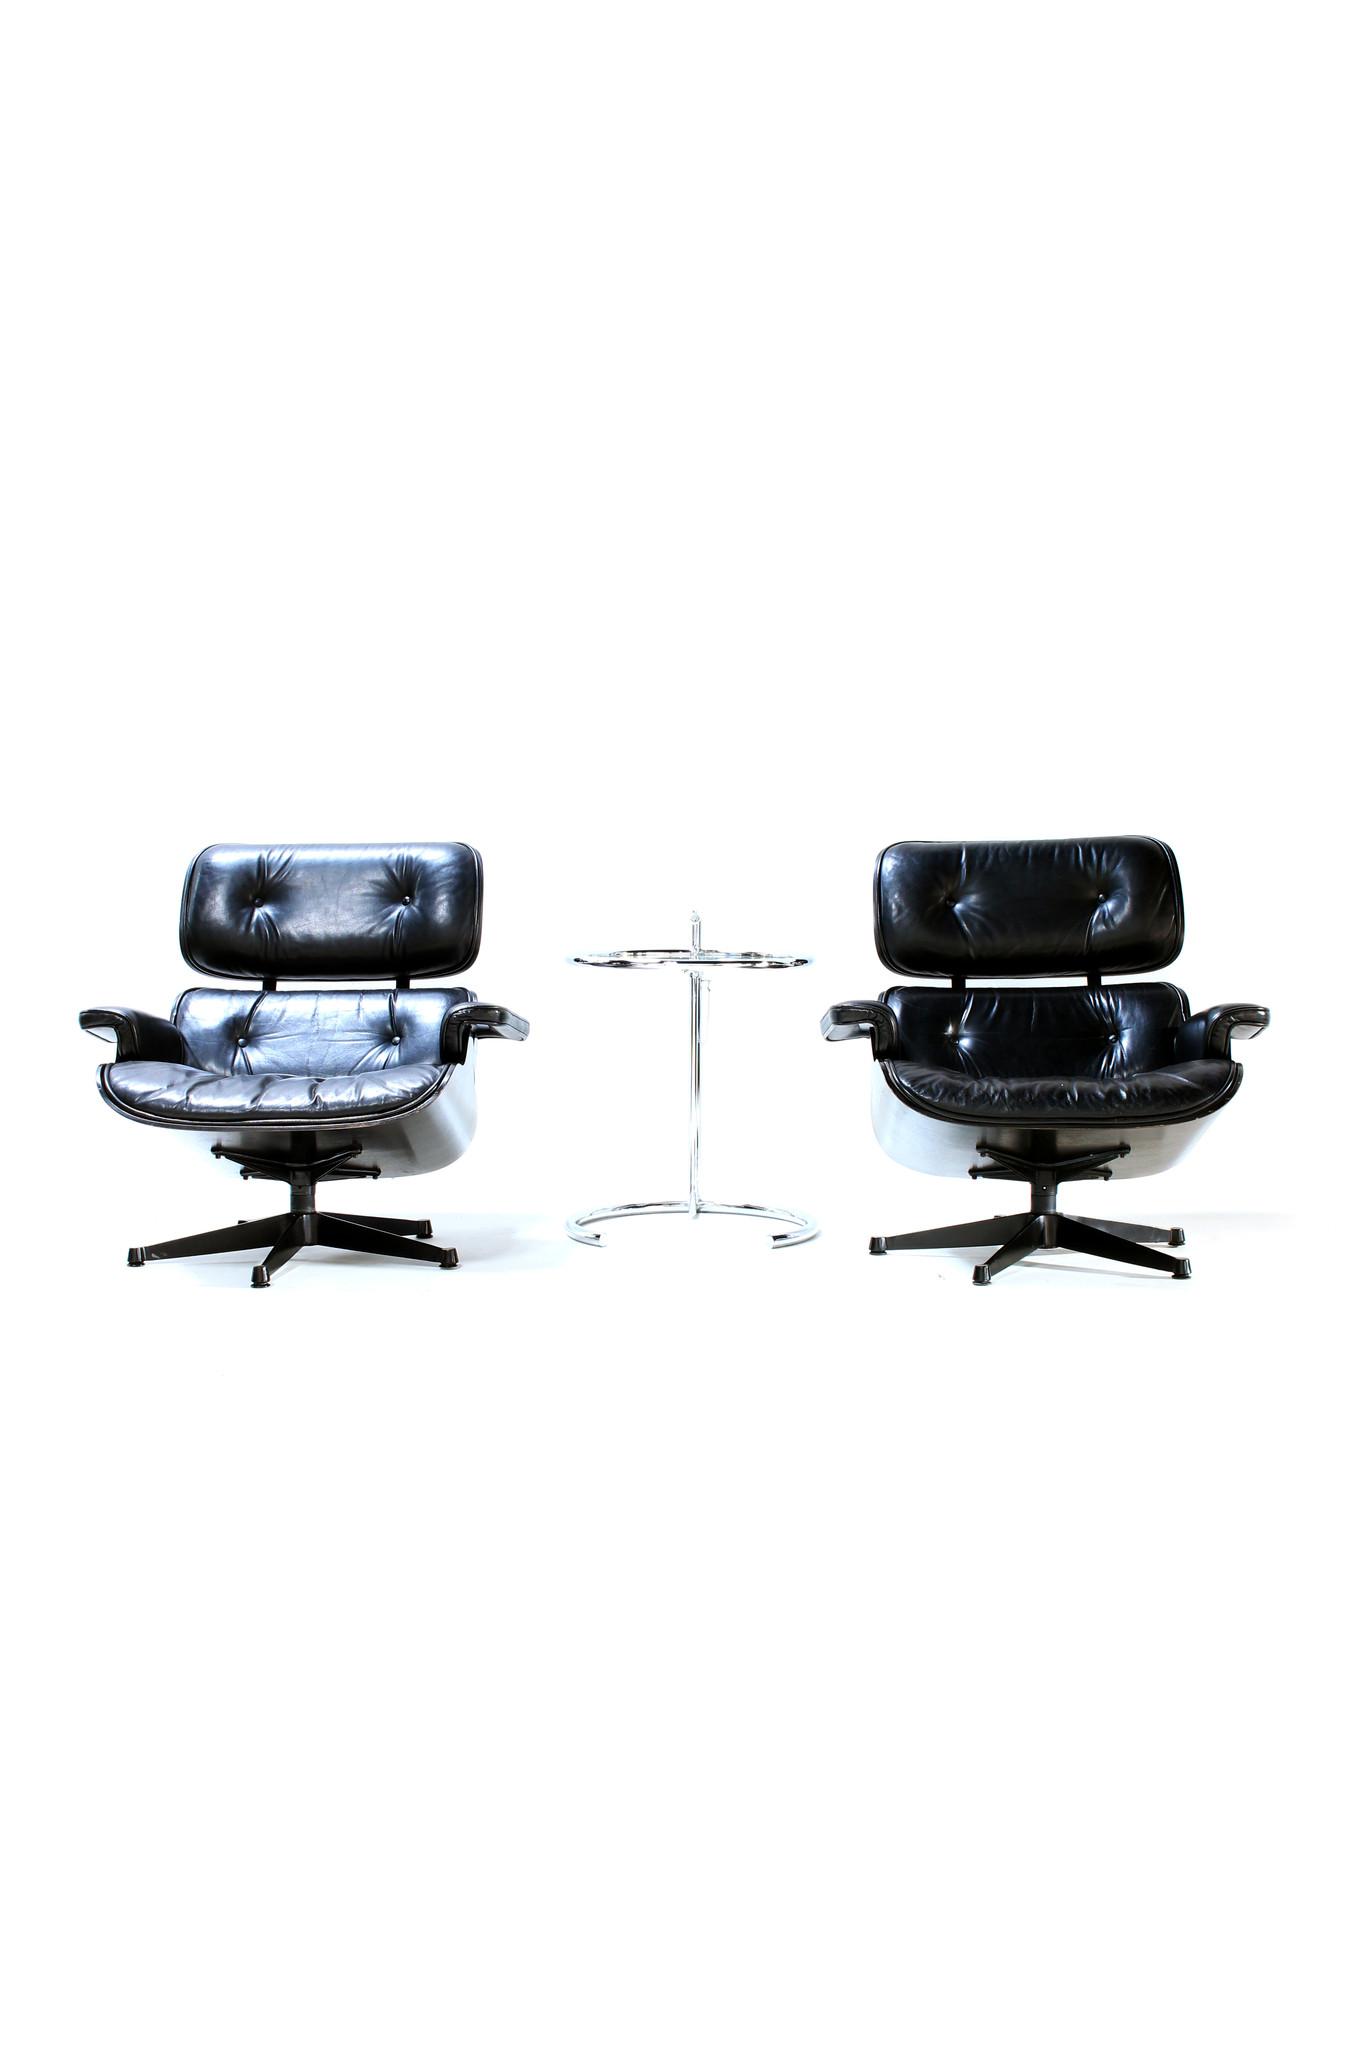 Eames Lounge chair set